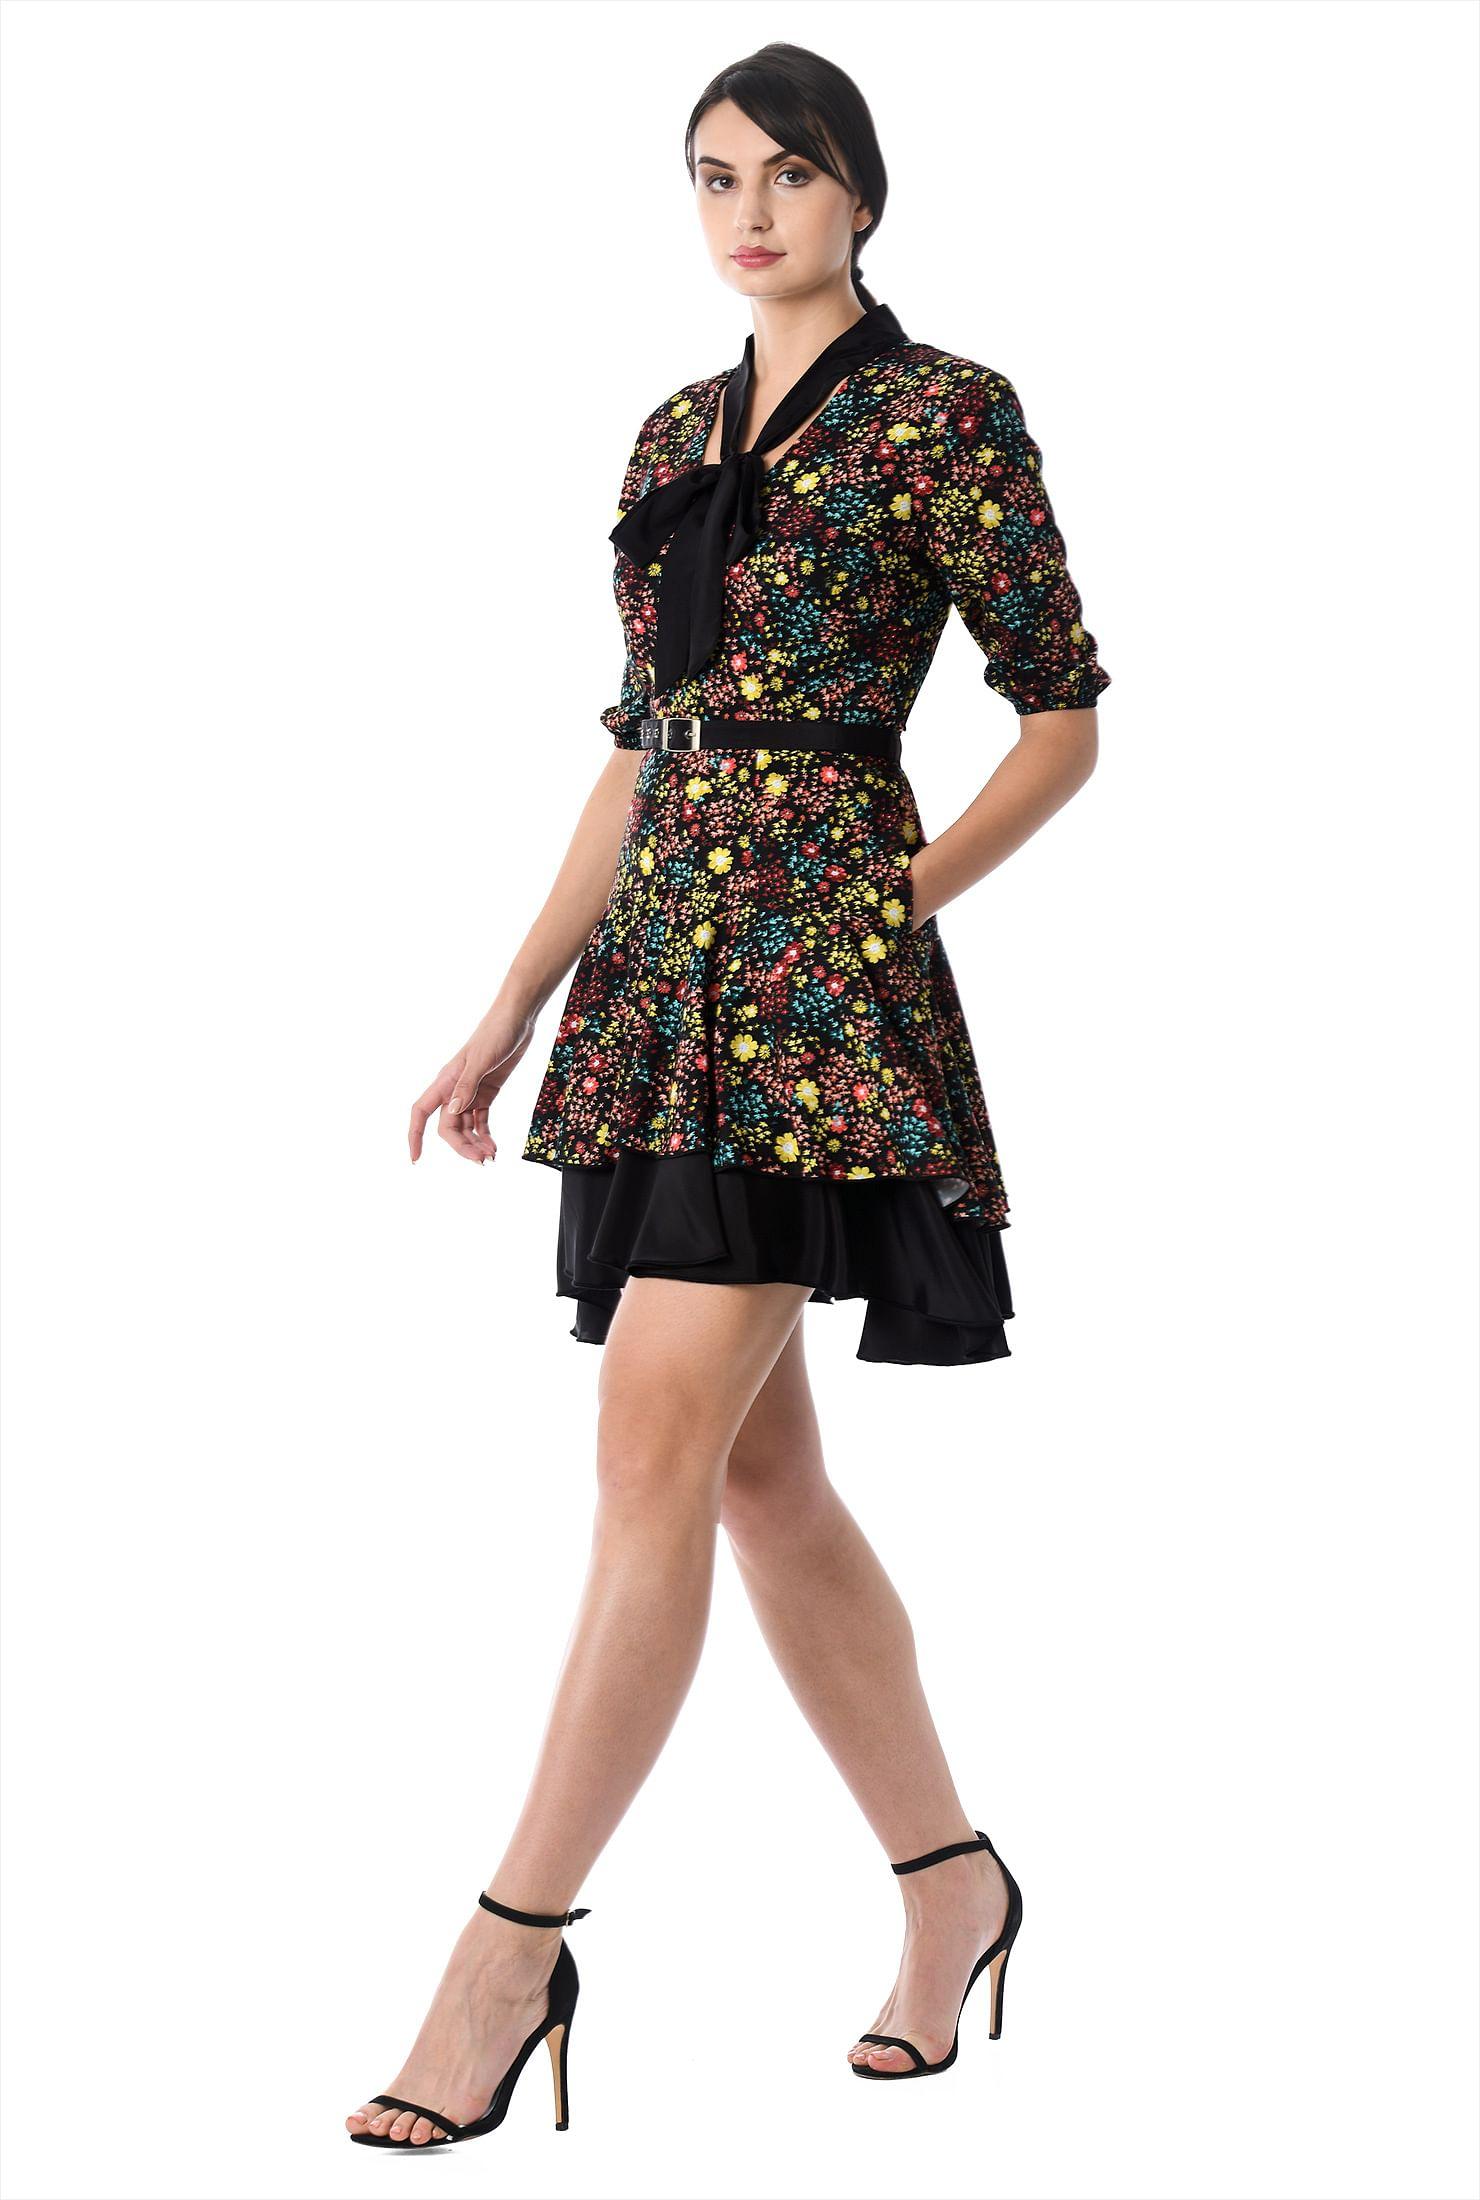 569d9148ad Women s Fashion Clothing 0-36W and Custom